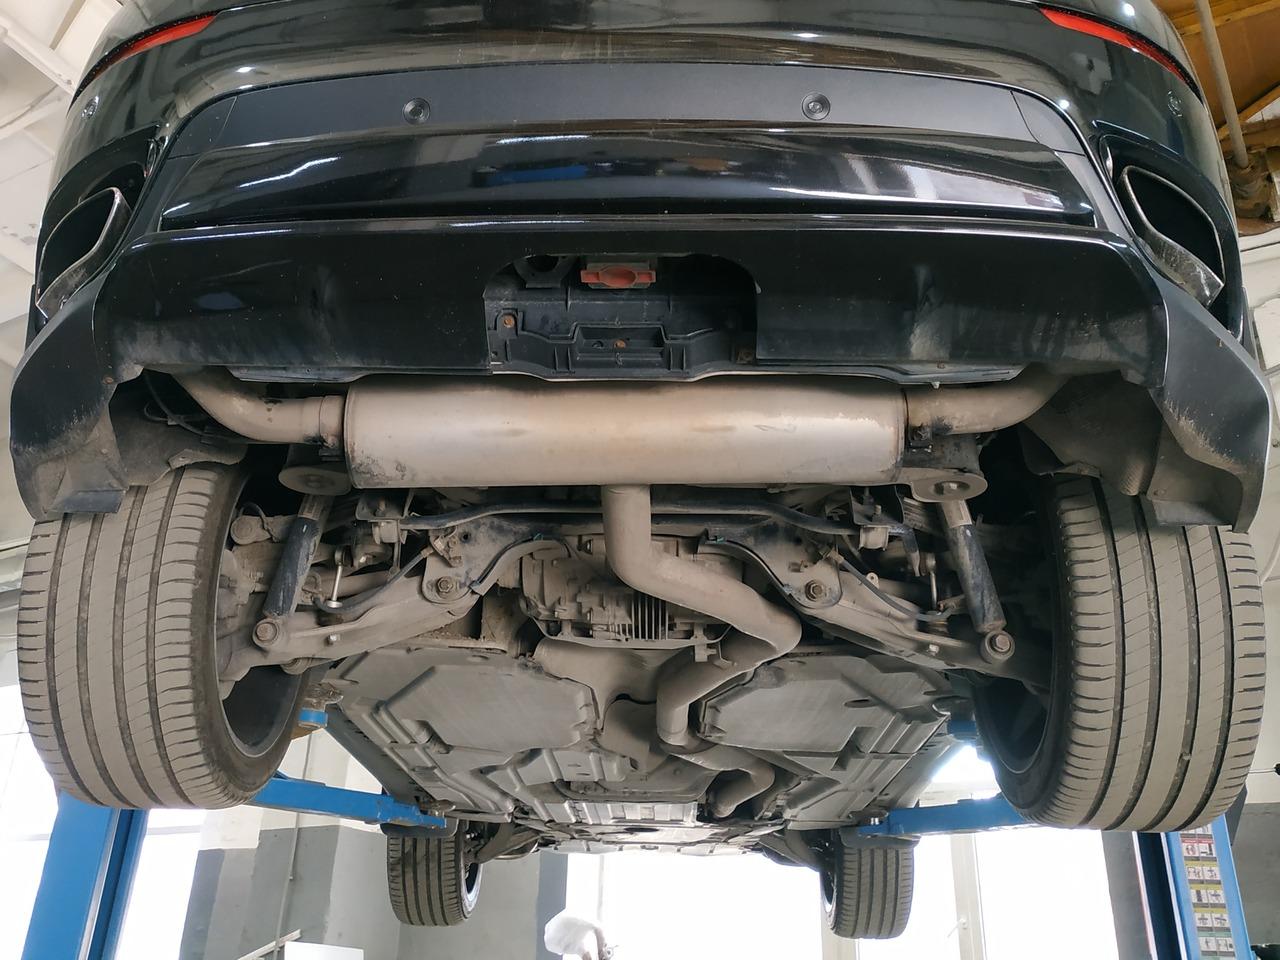 BMW X6M, вид сзади и снизу